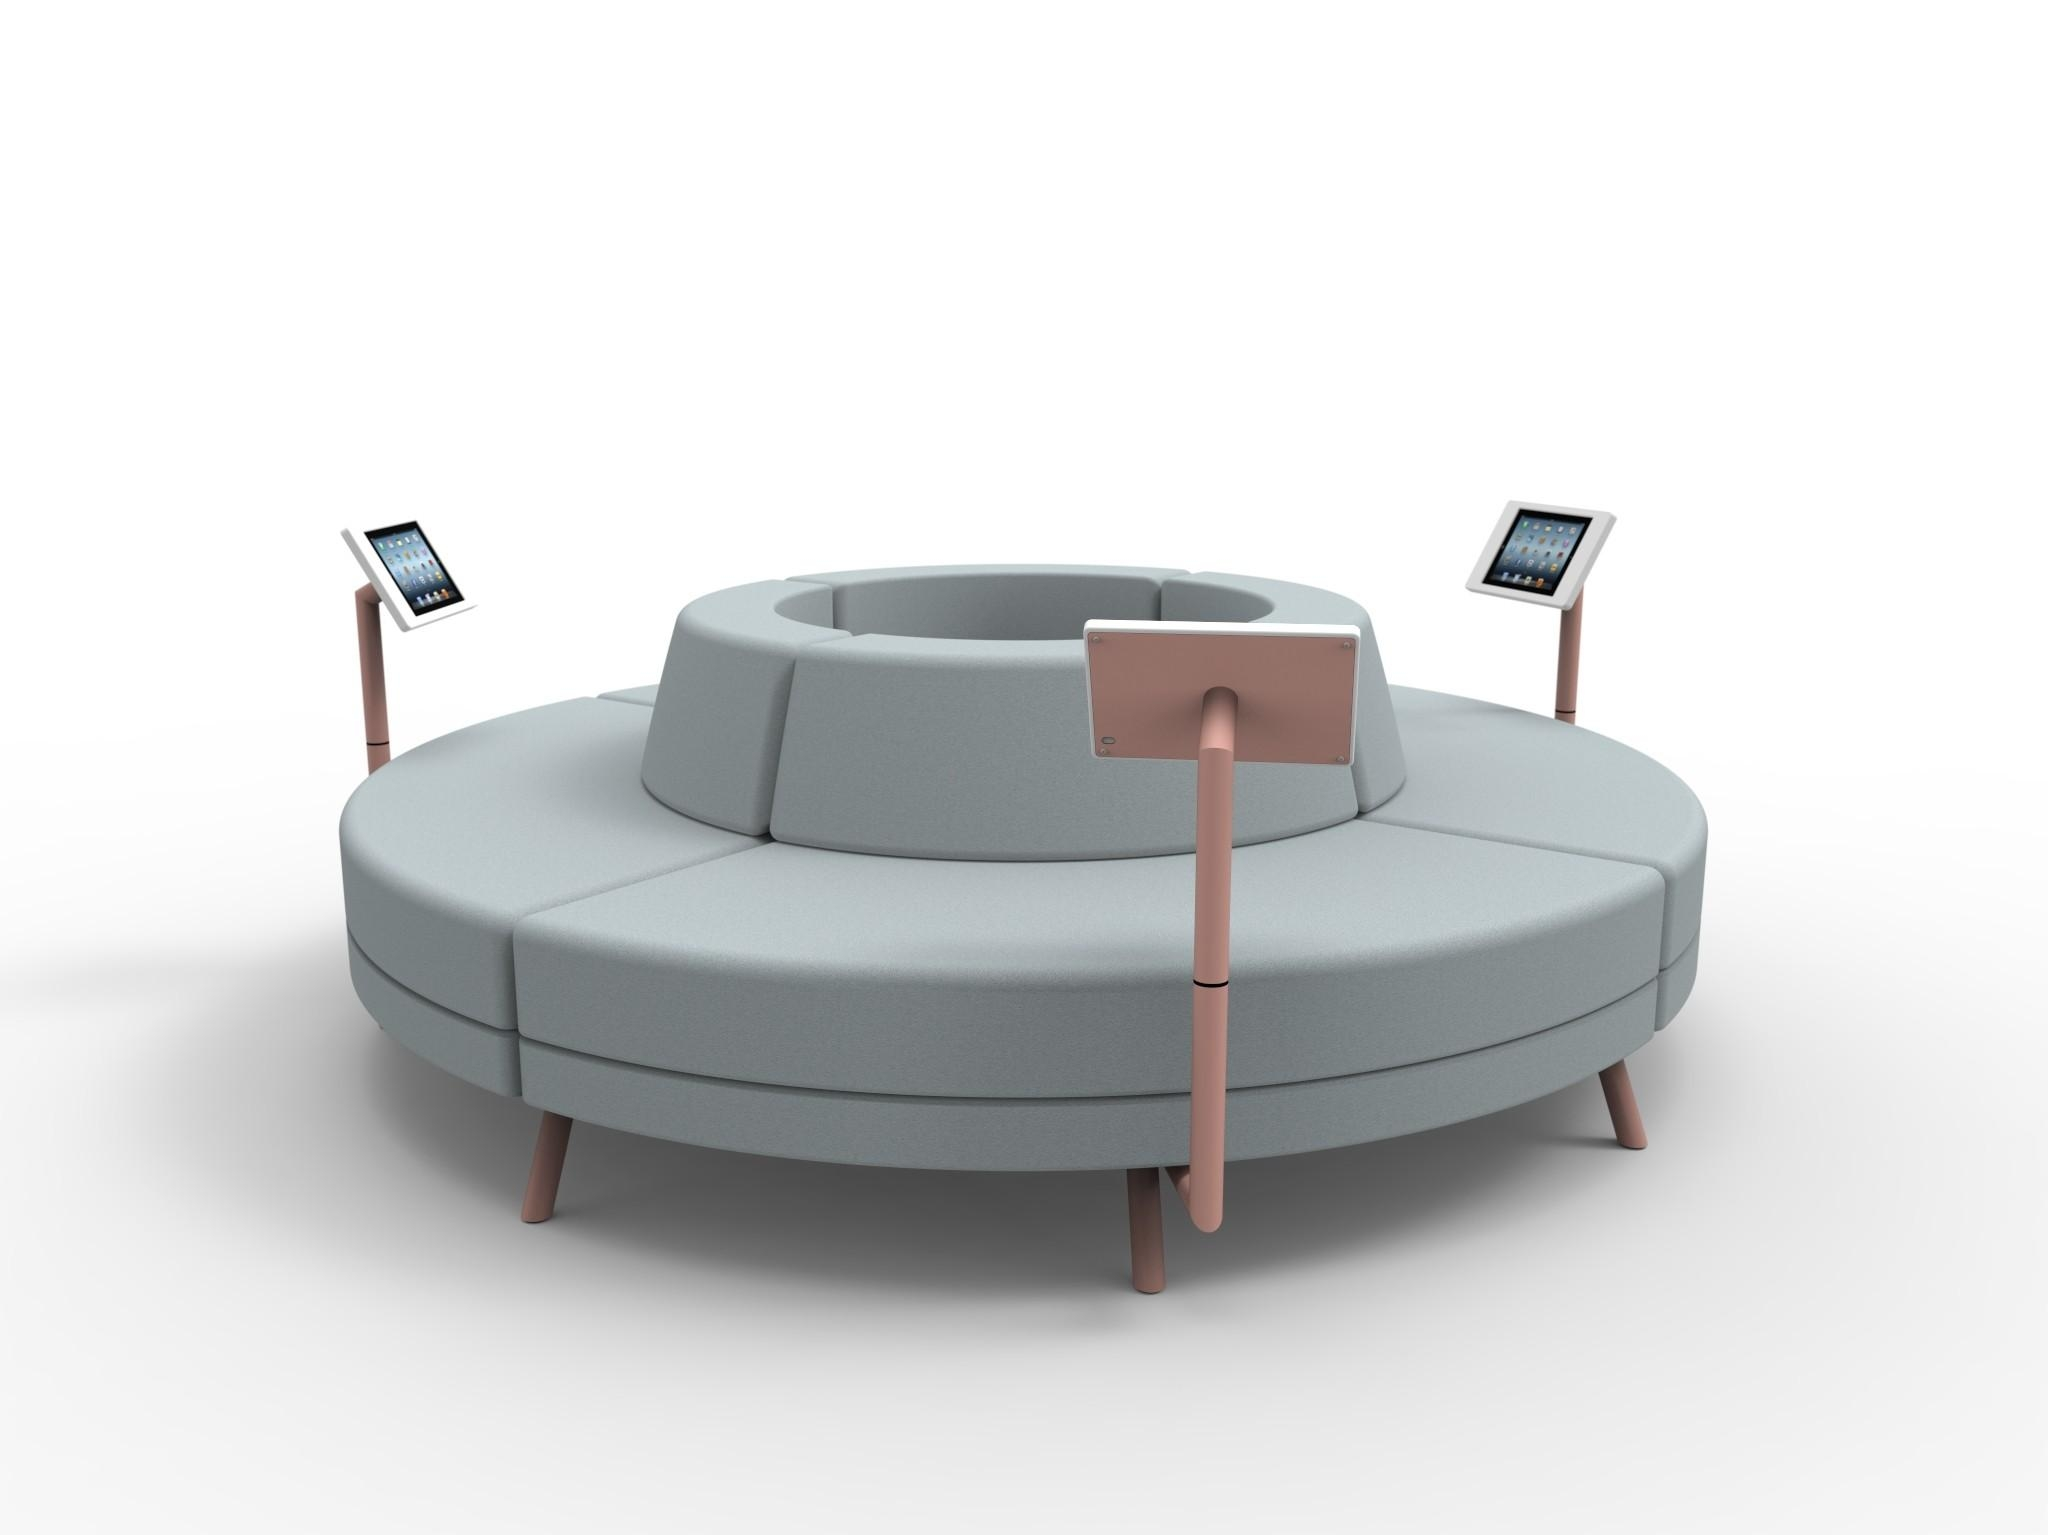 Round Sofas Canada – Gallery Image Iransafebox Pertaining To Round Sofas (Image 12 of 20)